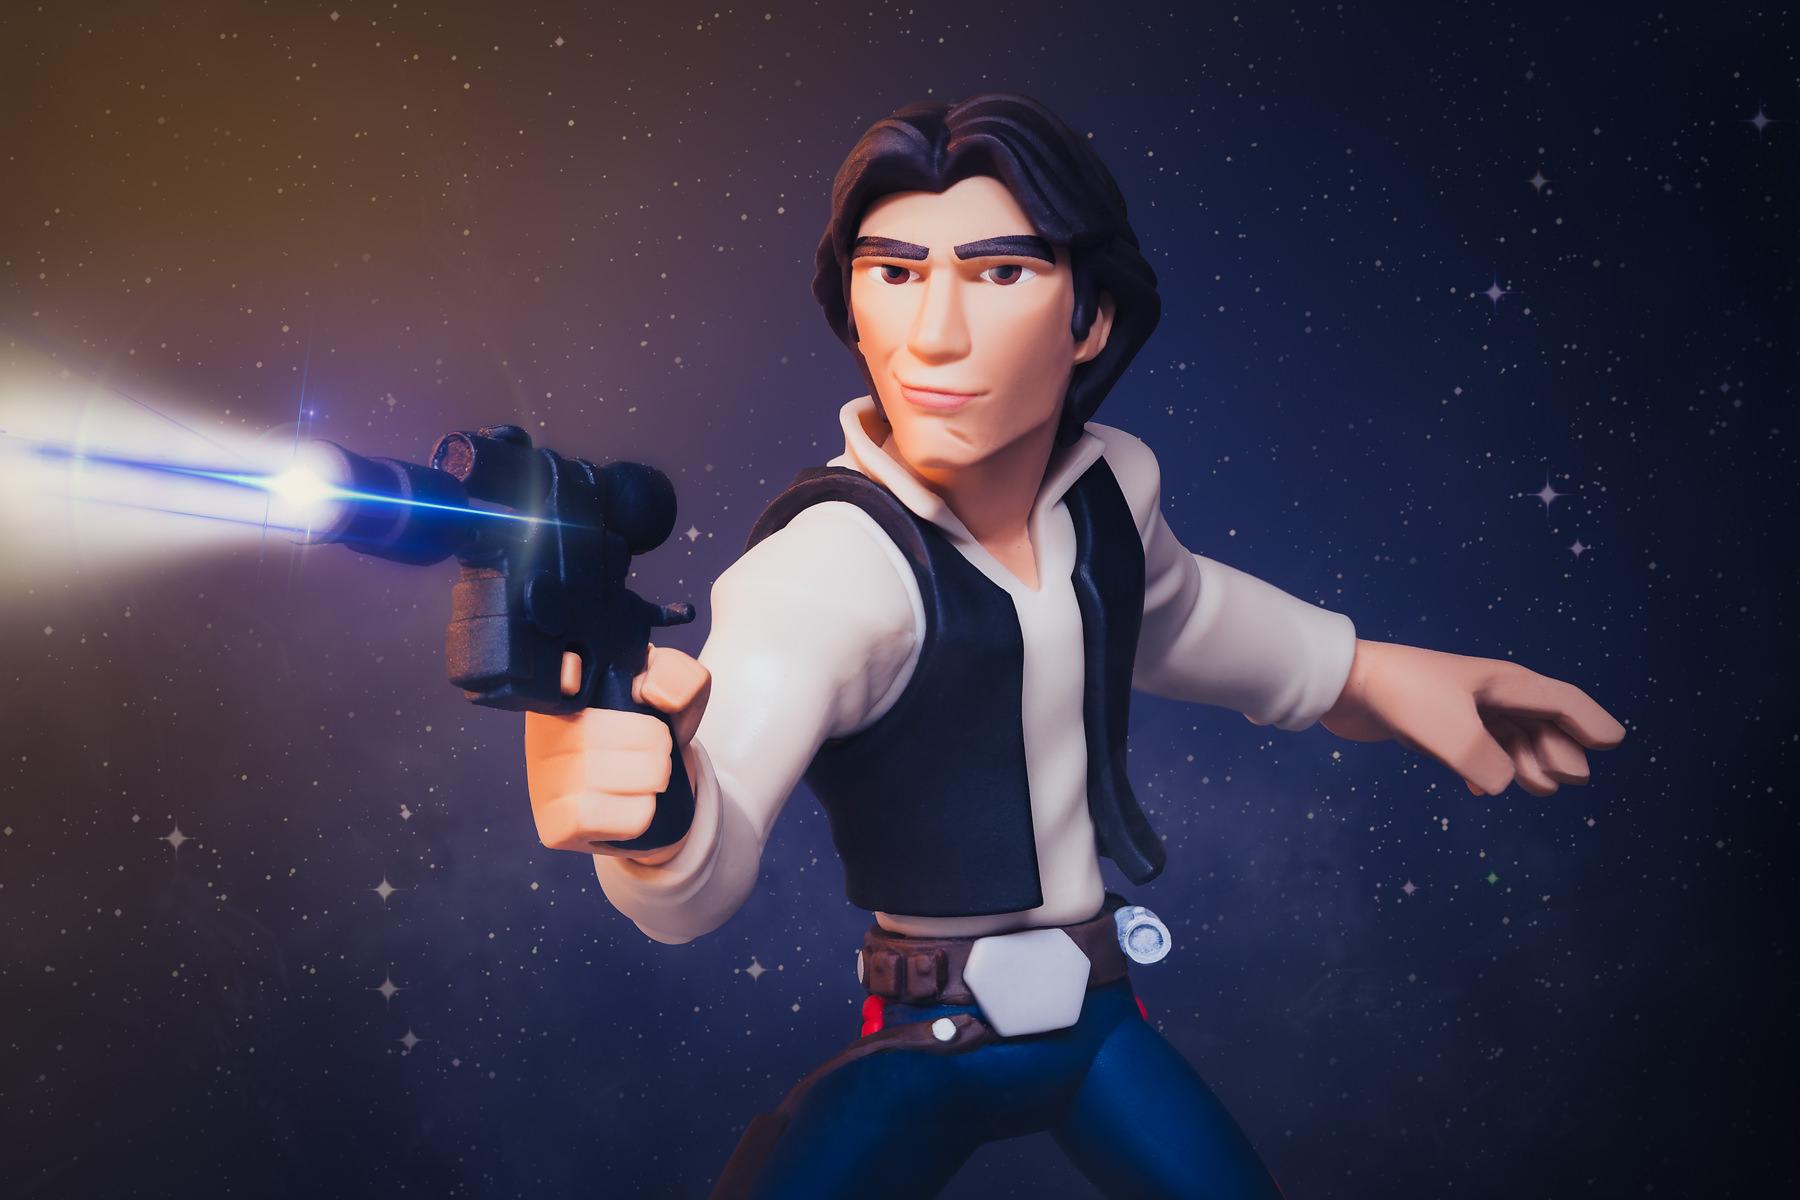 Disney Infinity Star Wars Han Solo